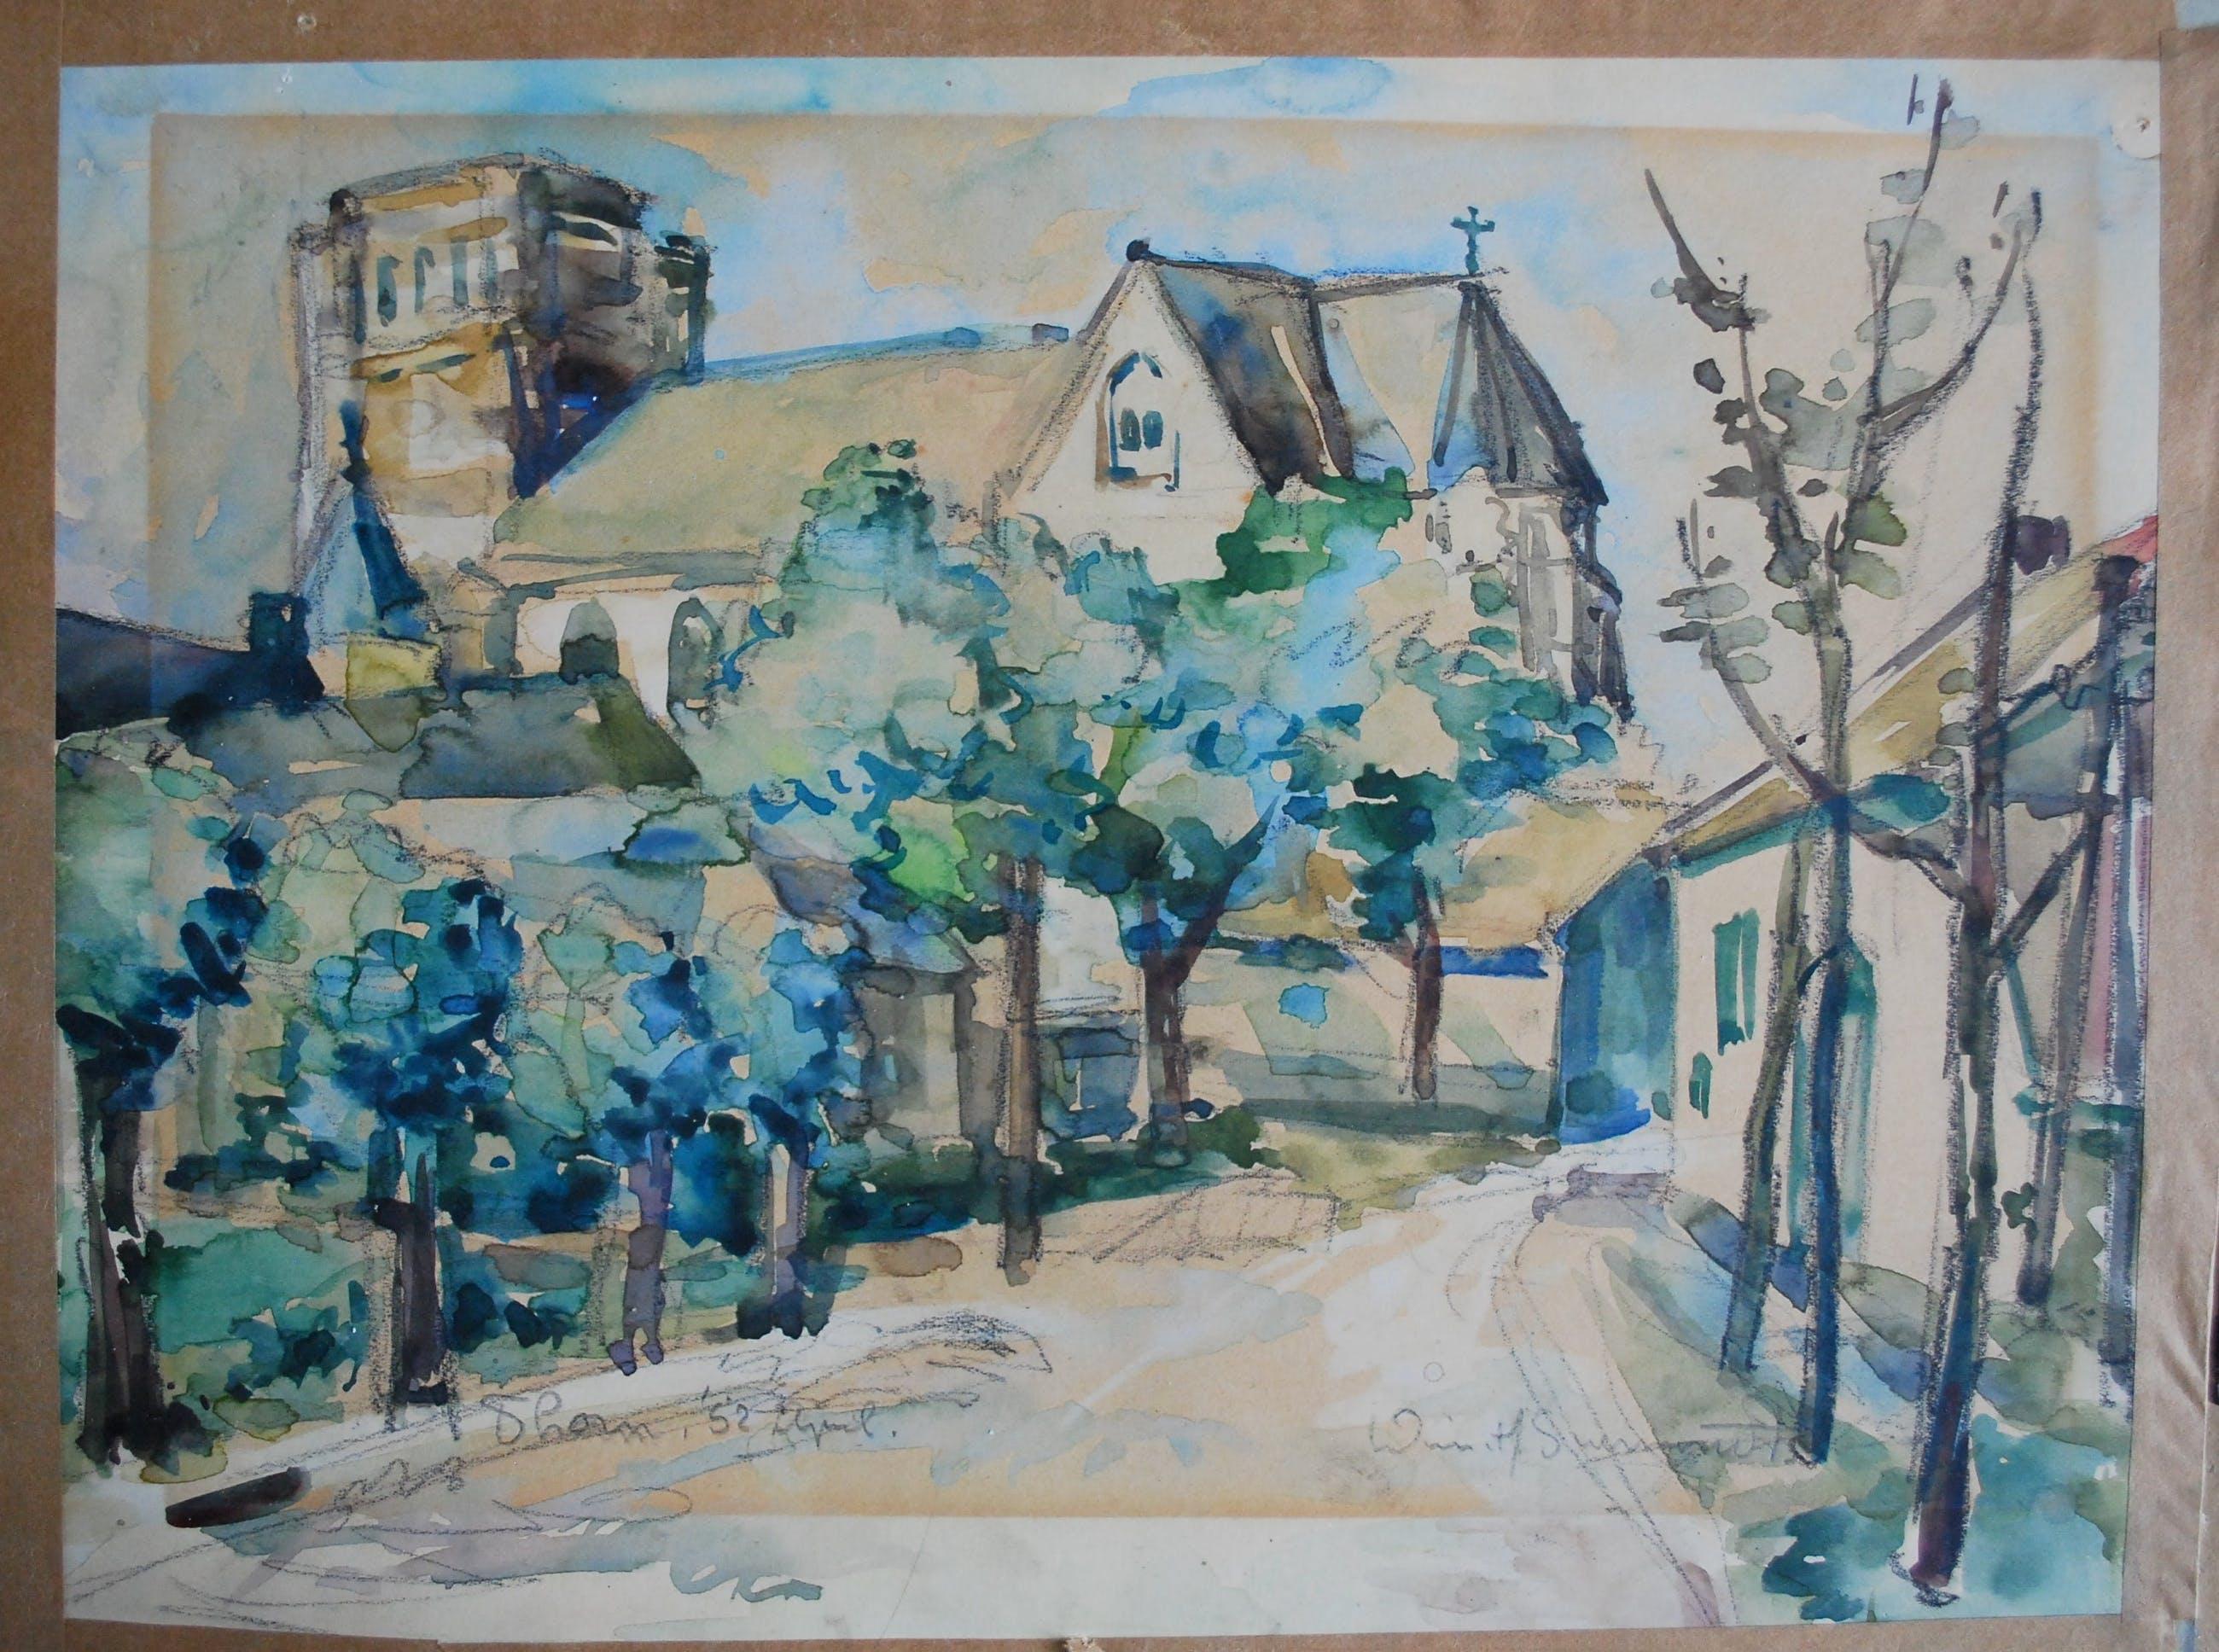 Wim Suermondt - Thorn, Limburg, stadsgezicht met kerk, 1952 kopen? Bied vanaf 65!